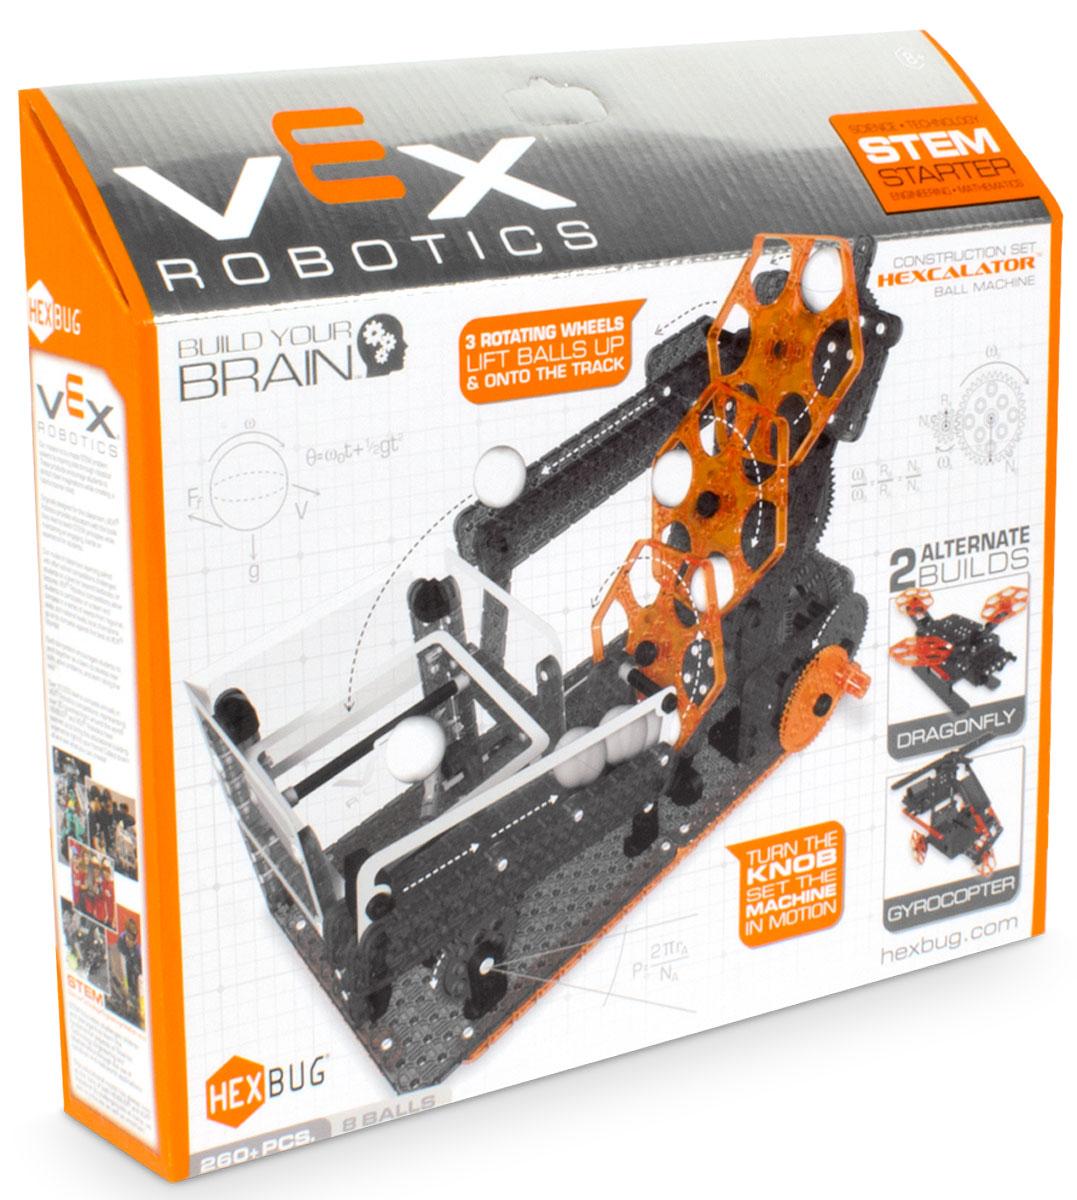 Hexbug Конструктор Vex Hexcalator Ball Machine hexbug конструктор vex crossbow launcher